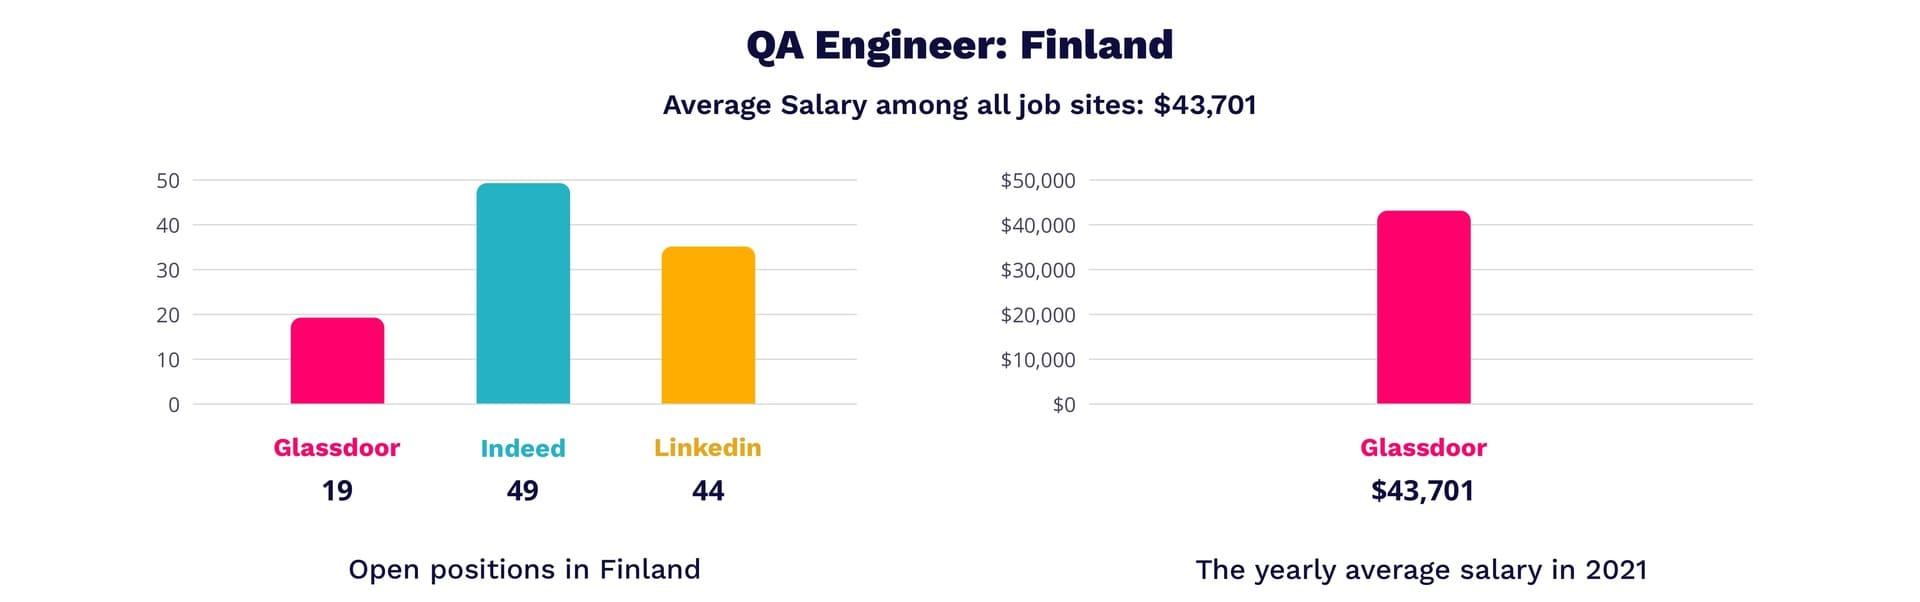 QA engineer salary in Finland